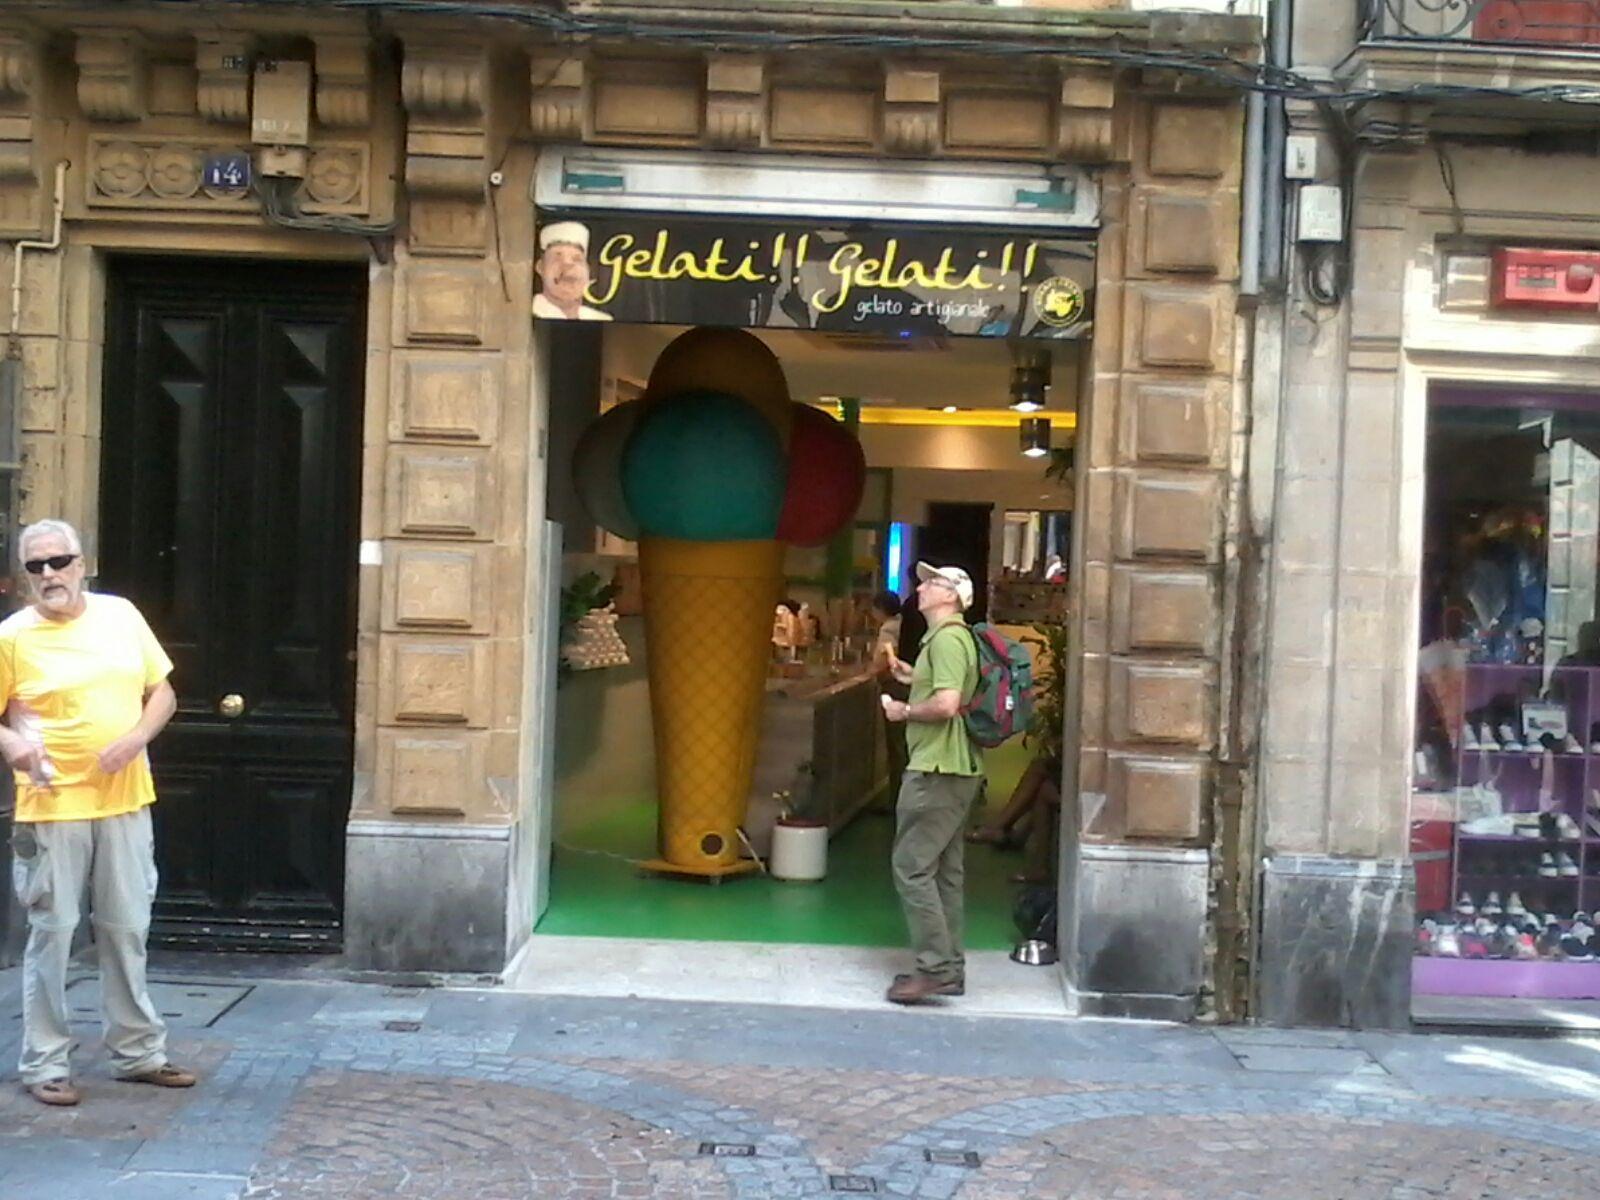 e9f16ac0f9e95 Nueva heladería Gelati Gelati (Diego Guglielmi-Bilbao Bizkaia Slow ...